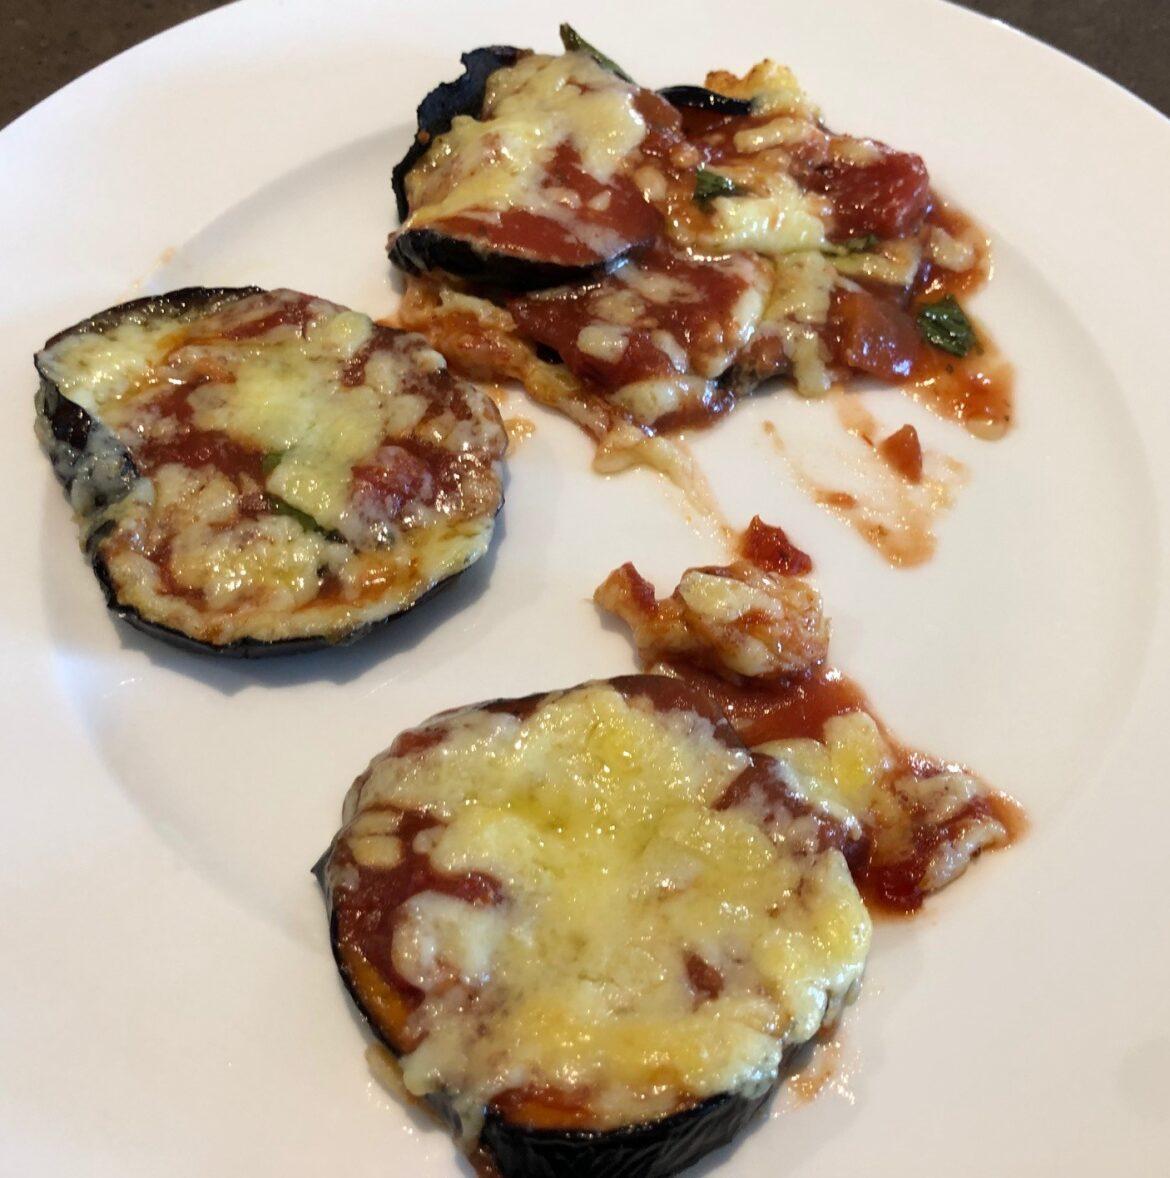 Eggplant dish 43: Eggplant pizza bites